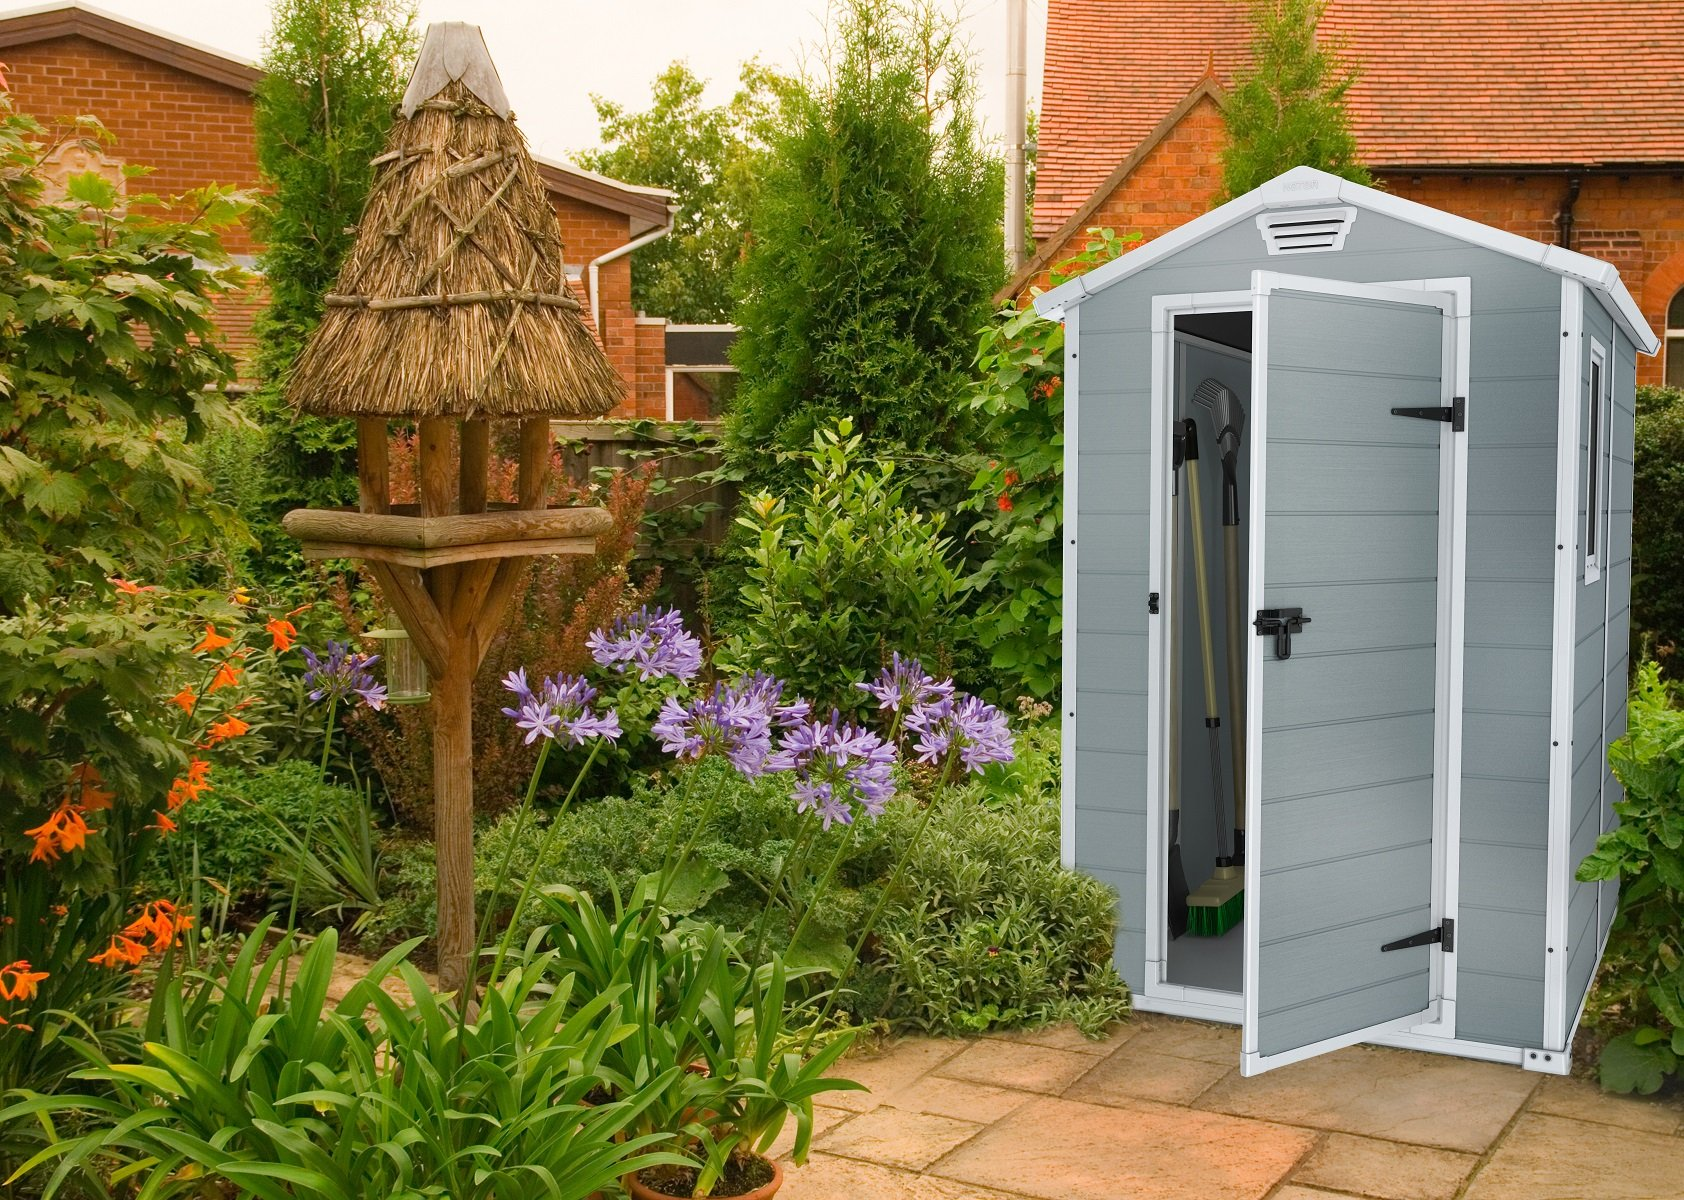 Keter Manor Outdoor Plastic Garden Storage Shed, Grey, 6 x 4 ft